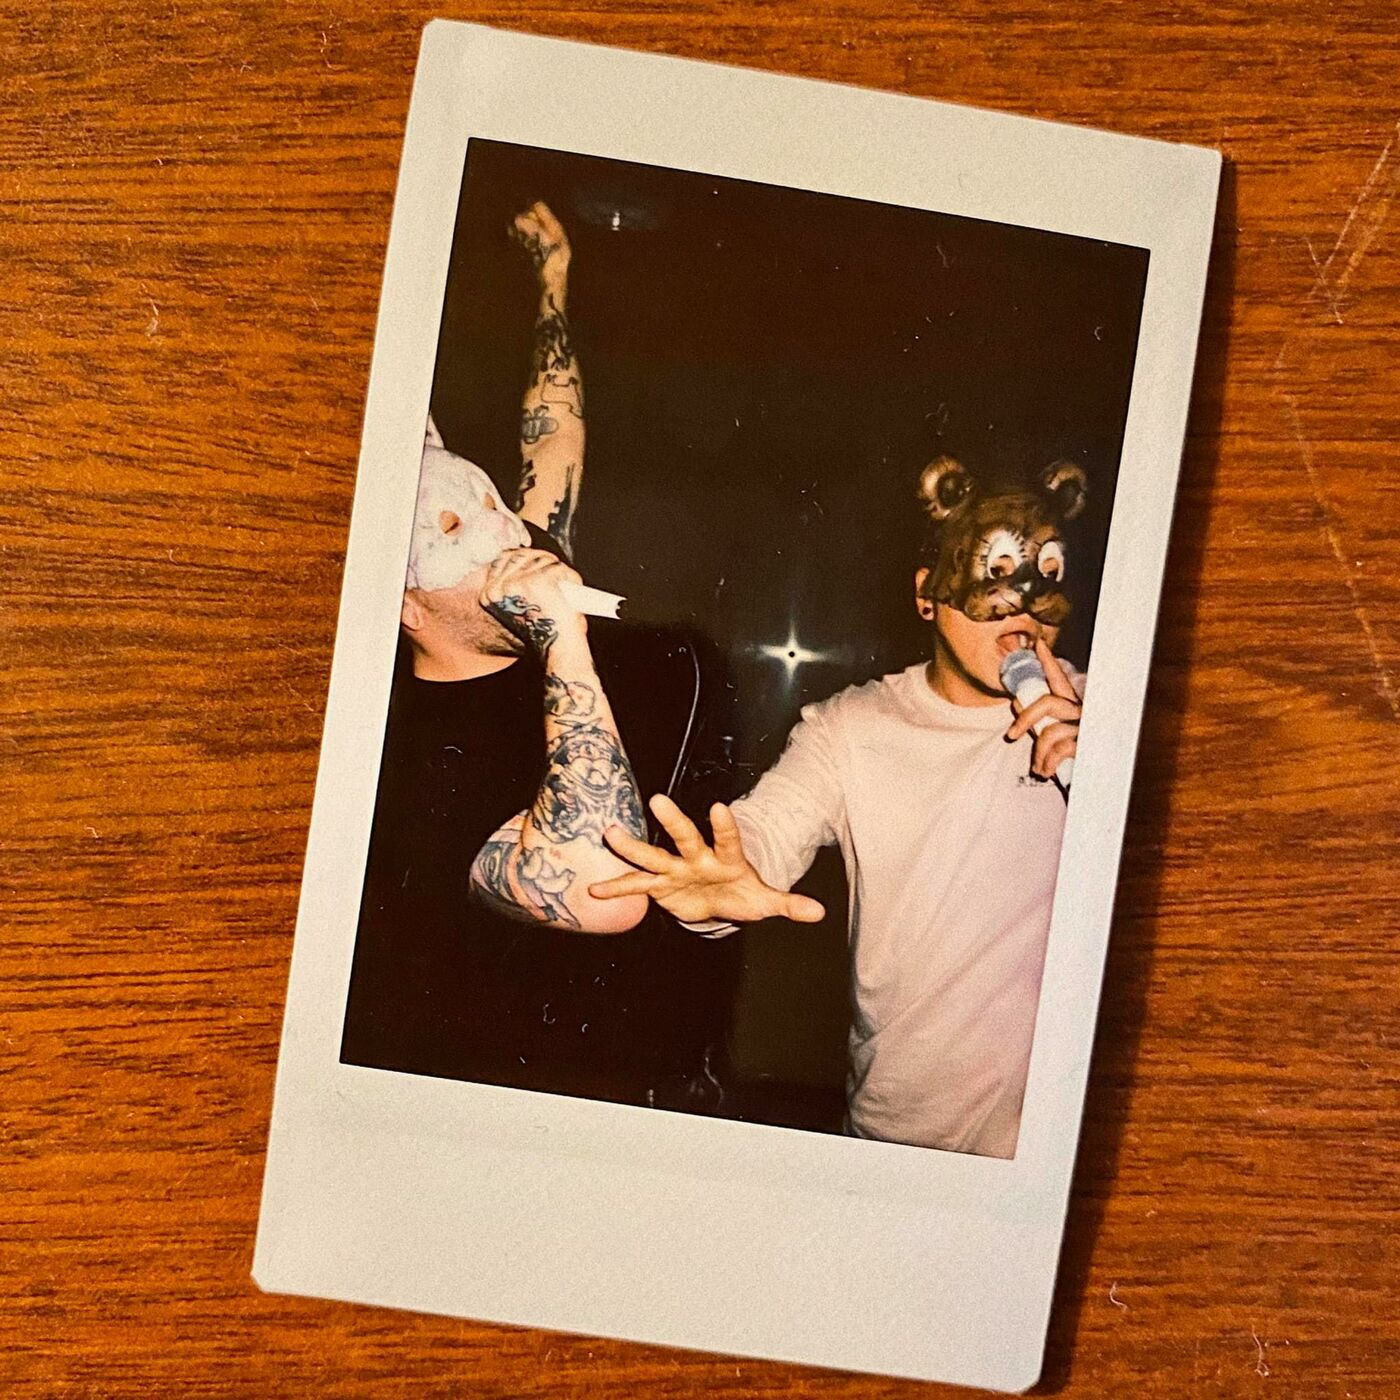 The Bunny The Bear - Visions [single] (2020)